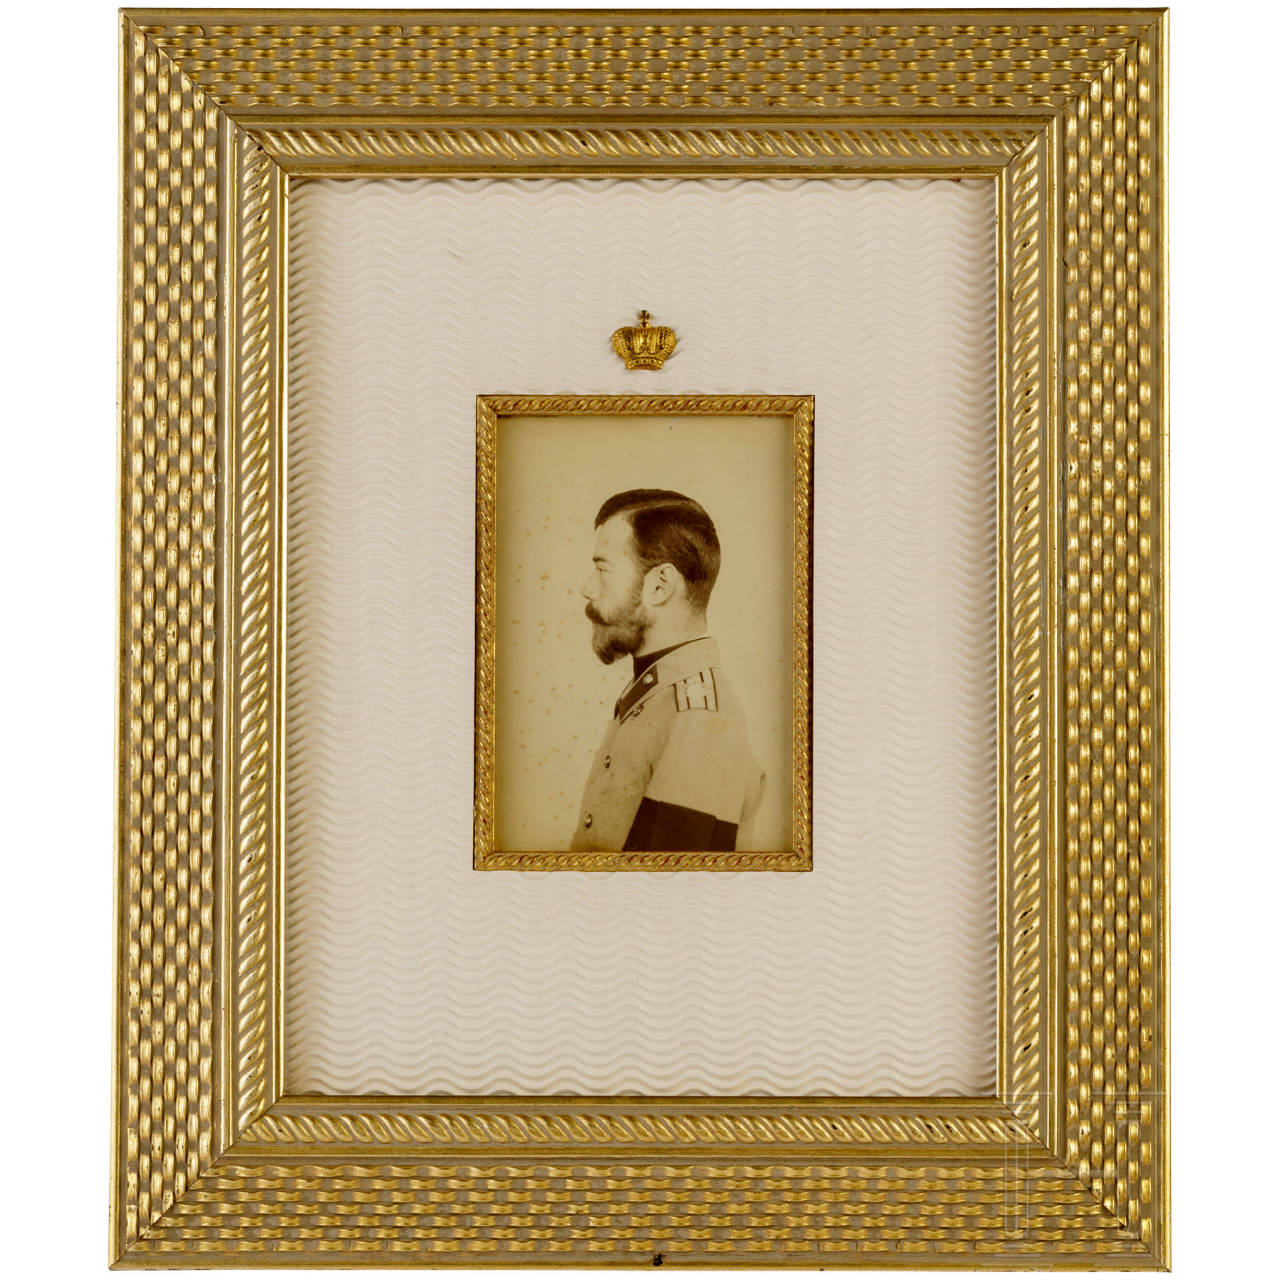 Photo of Grand Duke Alexander Romanov and Grand Duchess Xenia, as well as photo of Tsar Nicholas II.